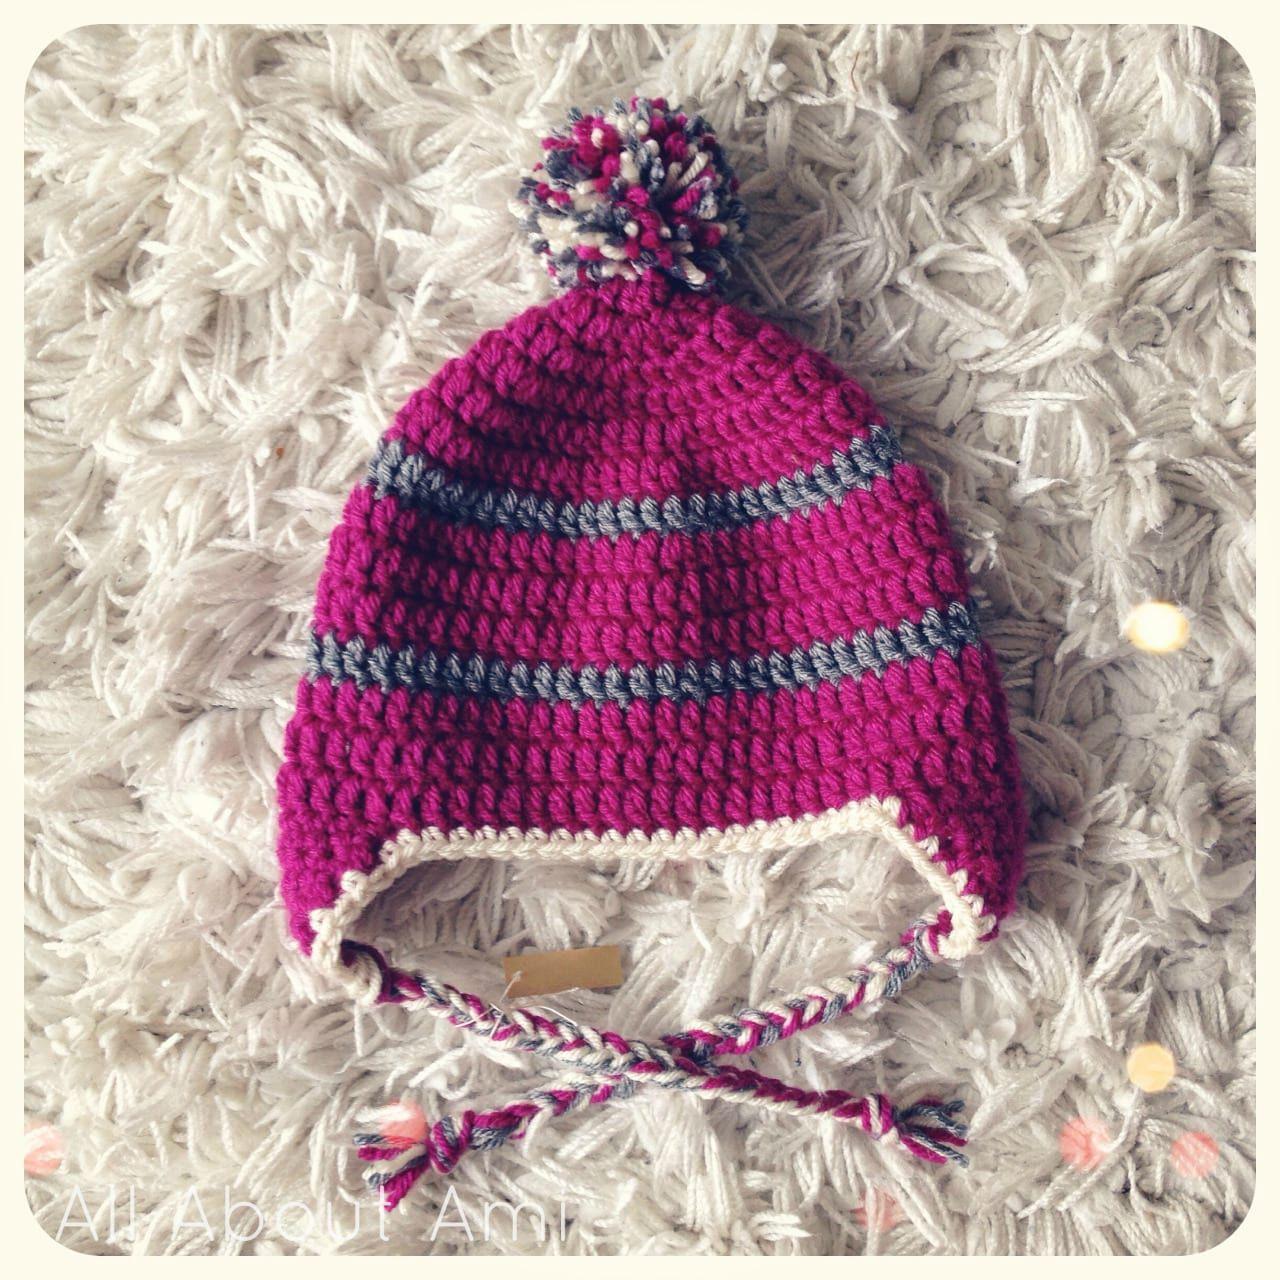 Continued | Crochet Patterns | Pinterest